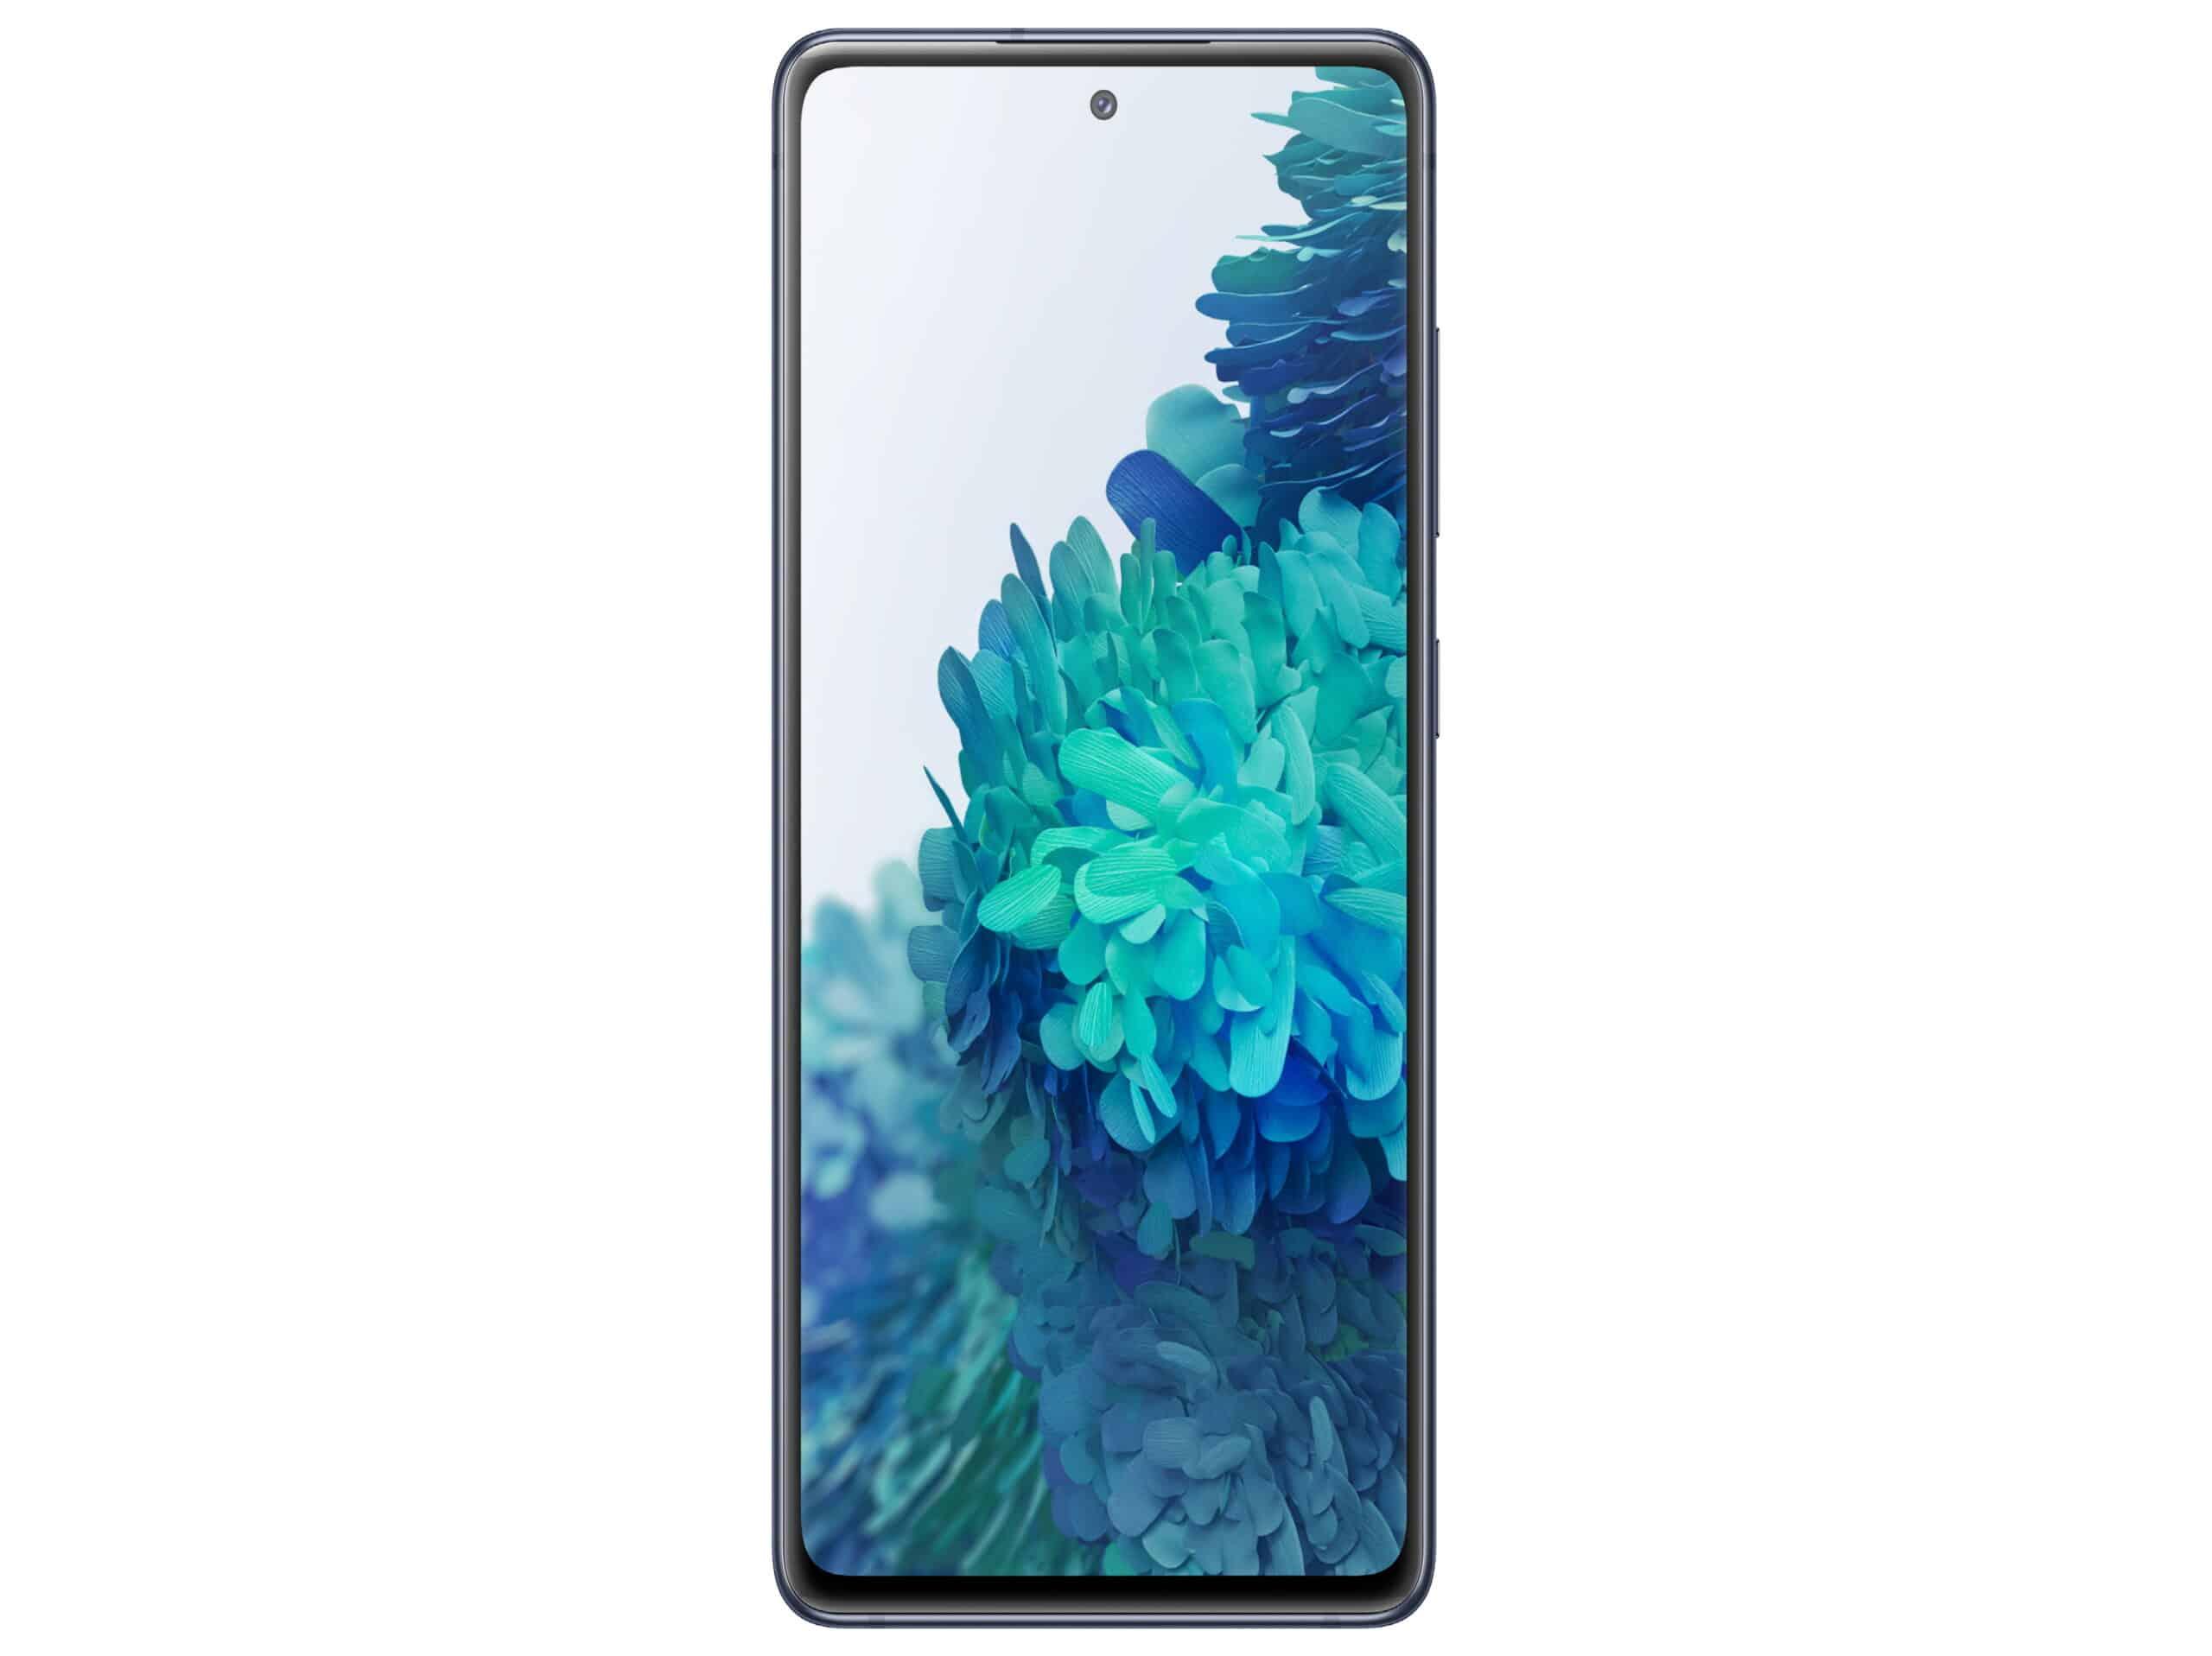 Samsung Galaxy S20 FE render